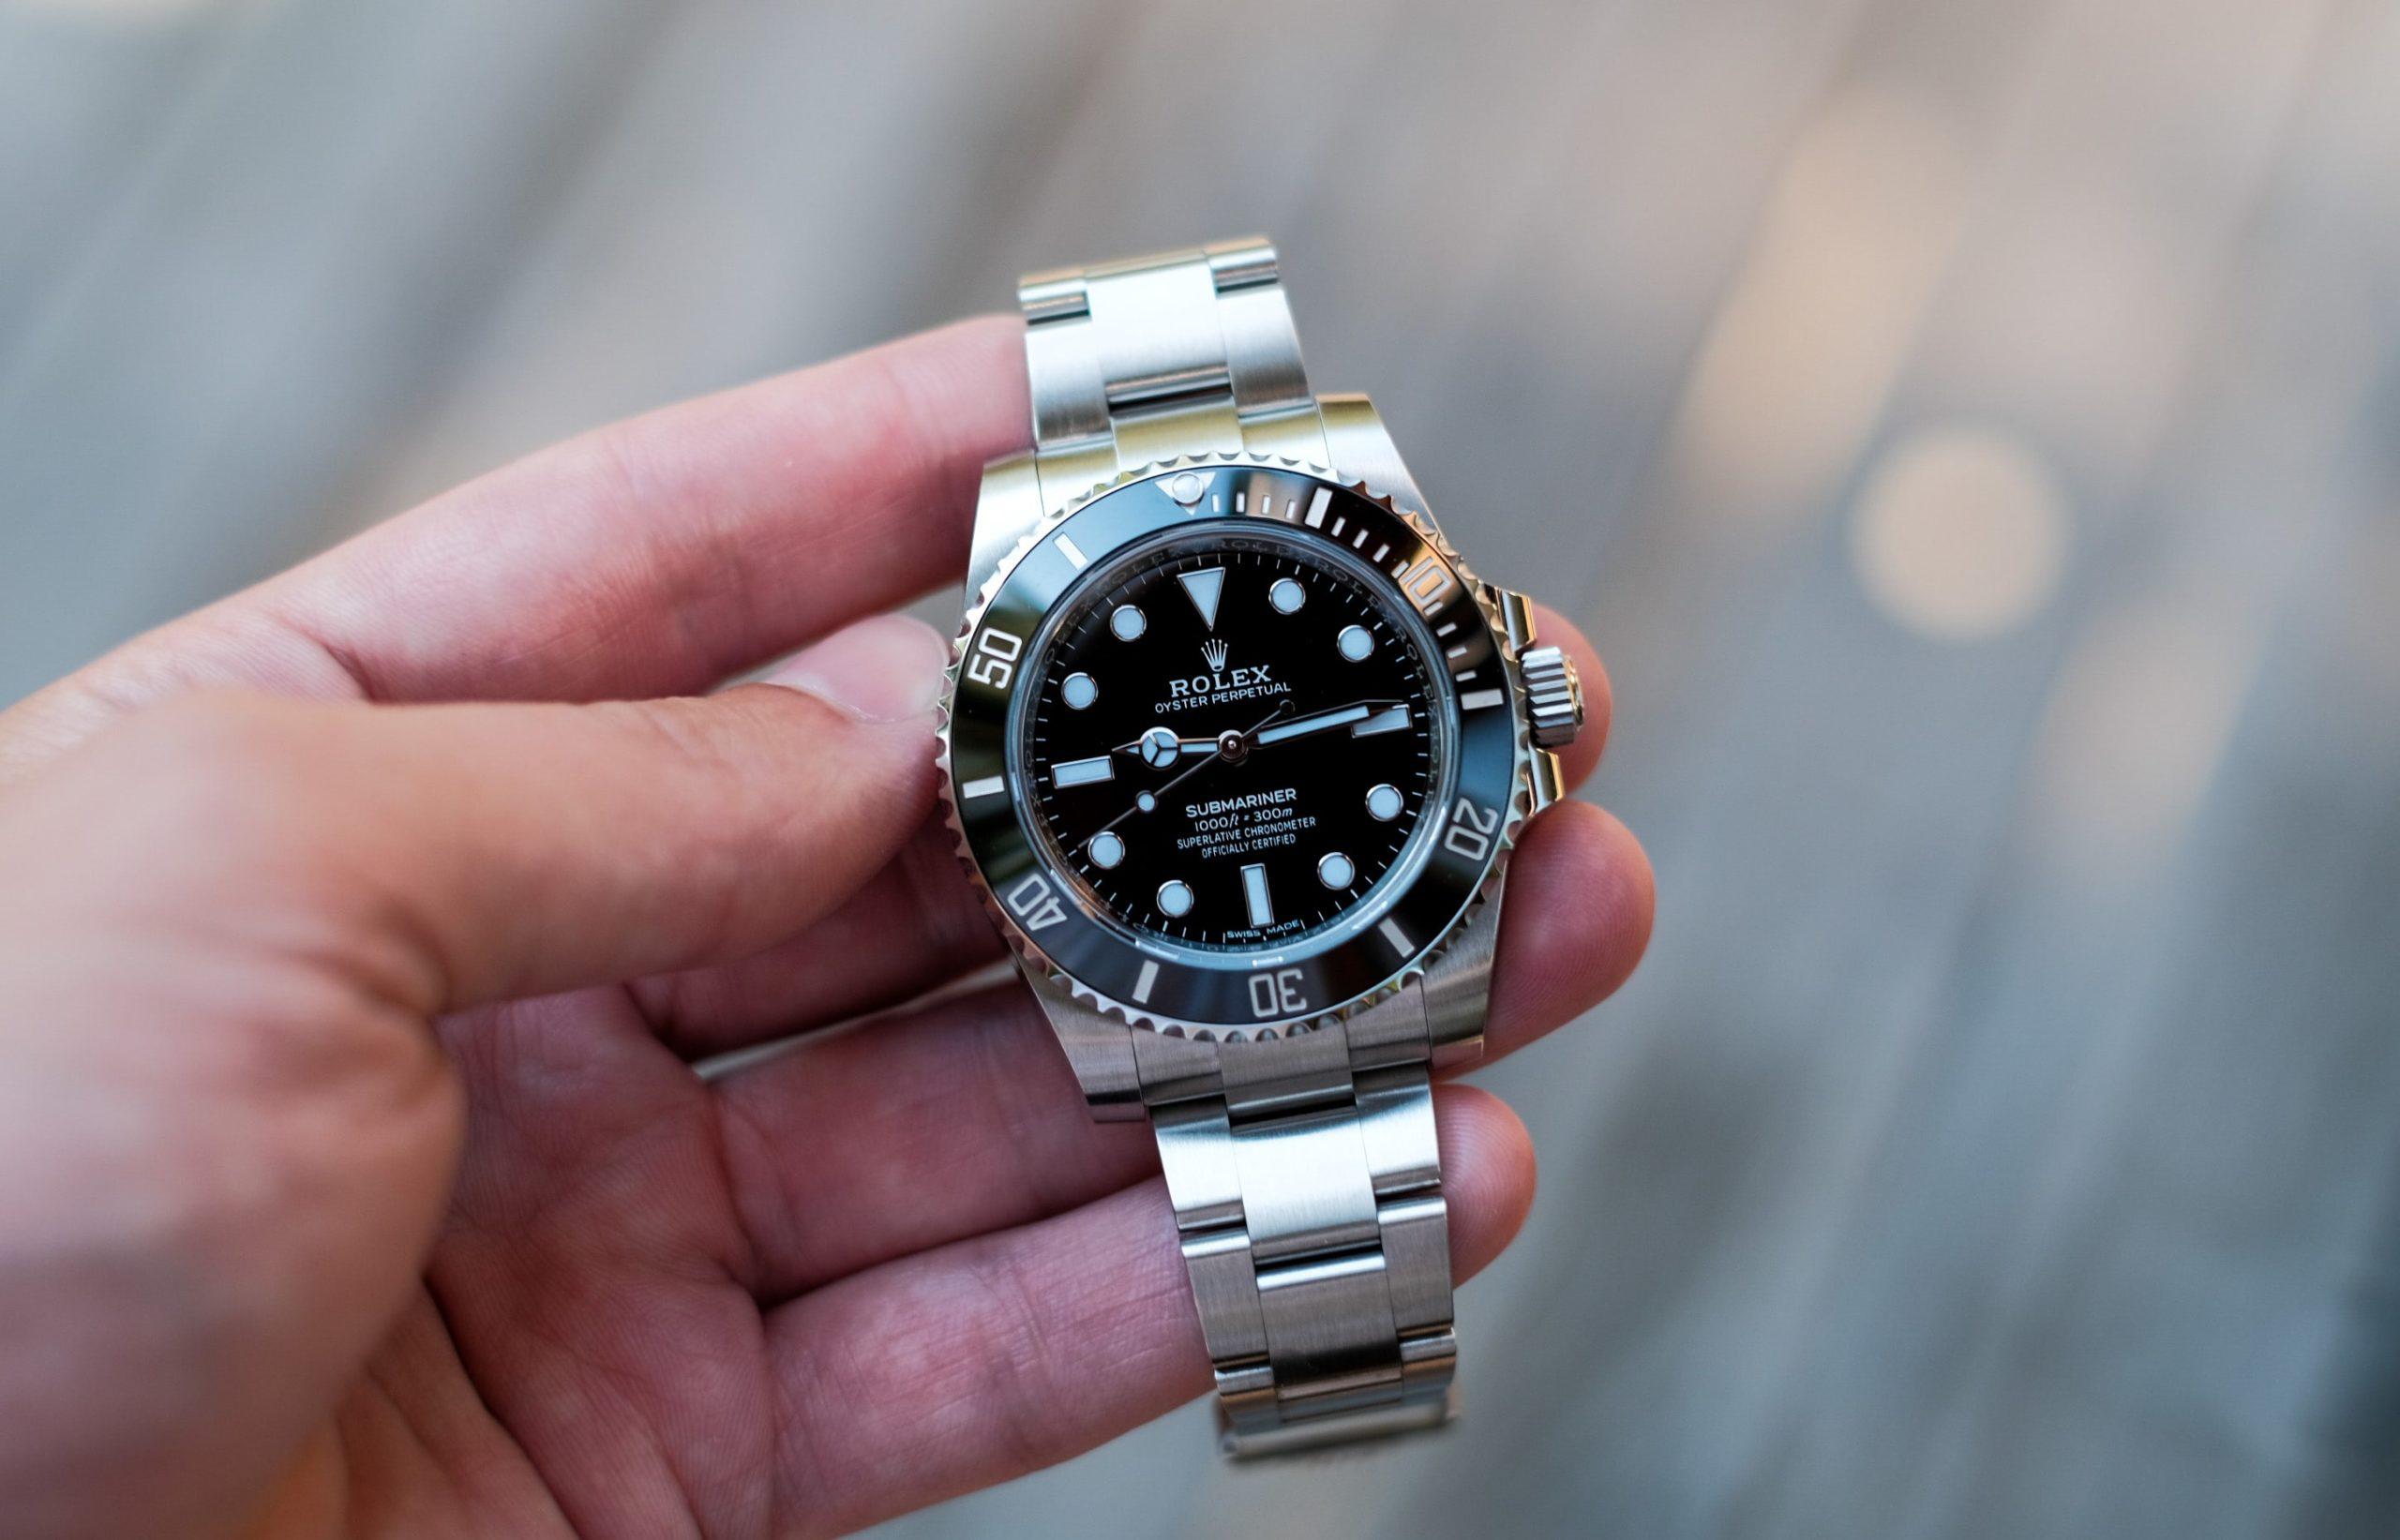 Rolex Submariner 114060 Watch Review